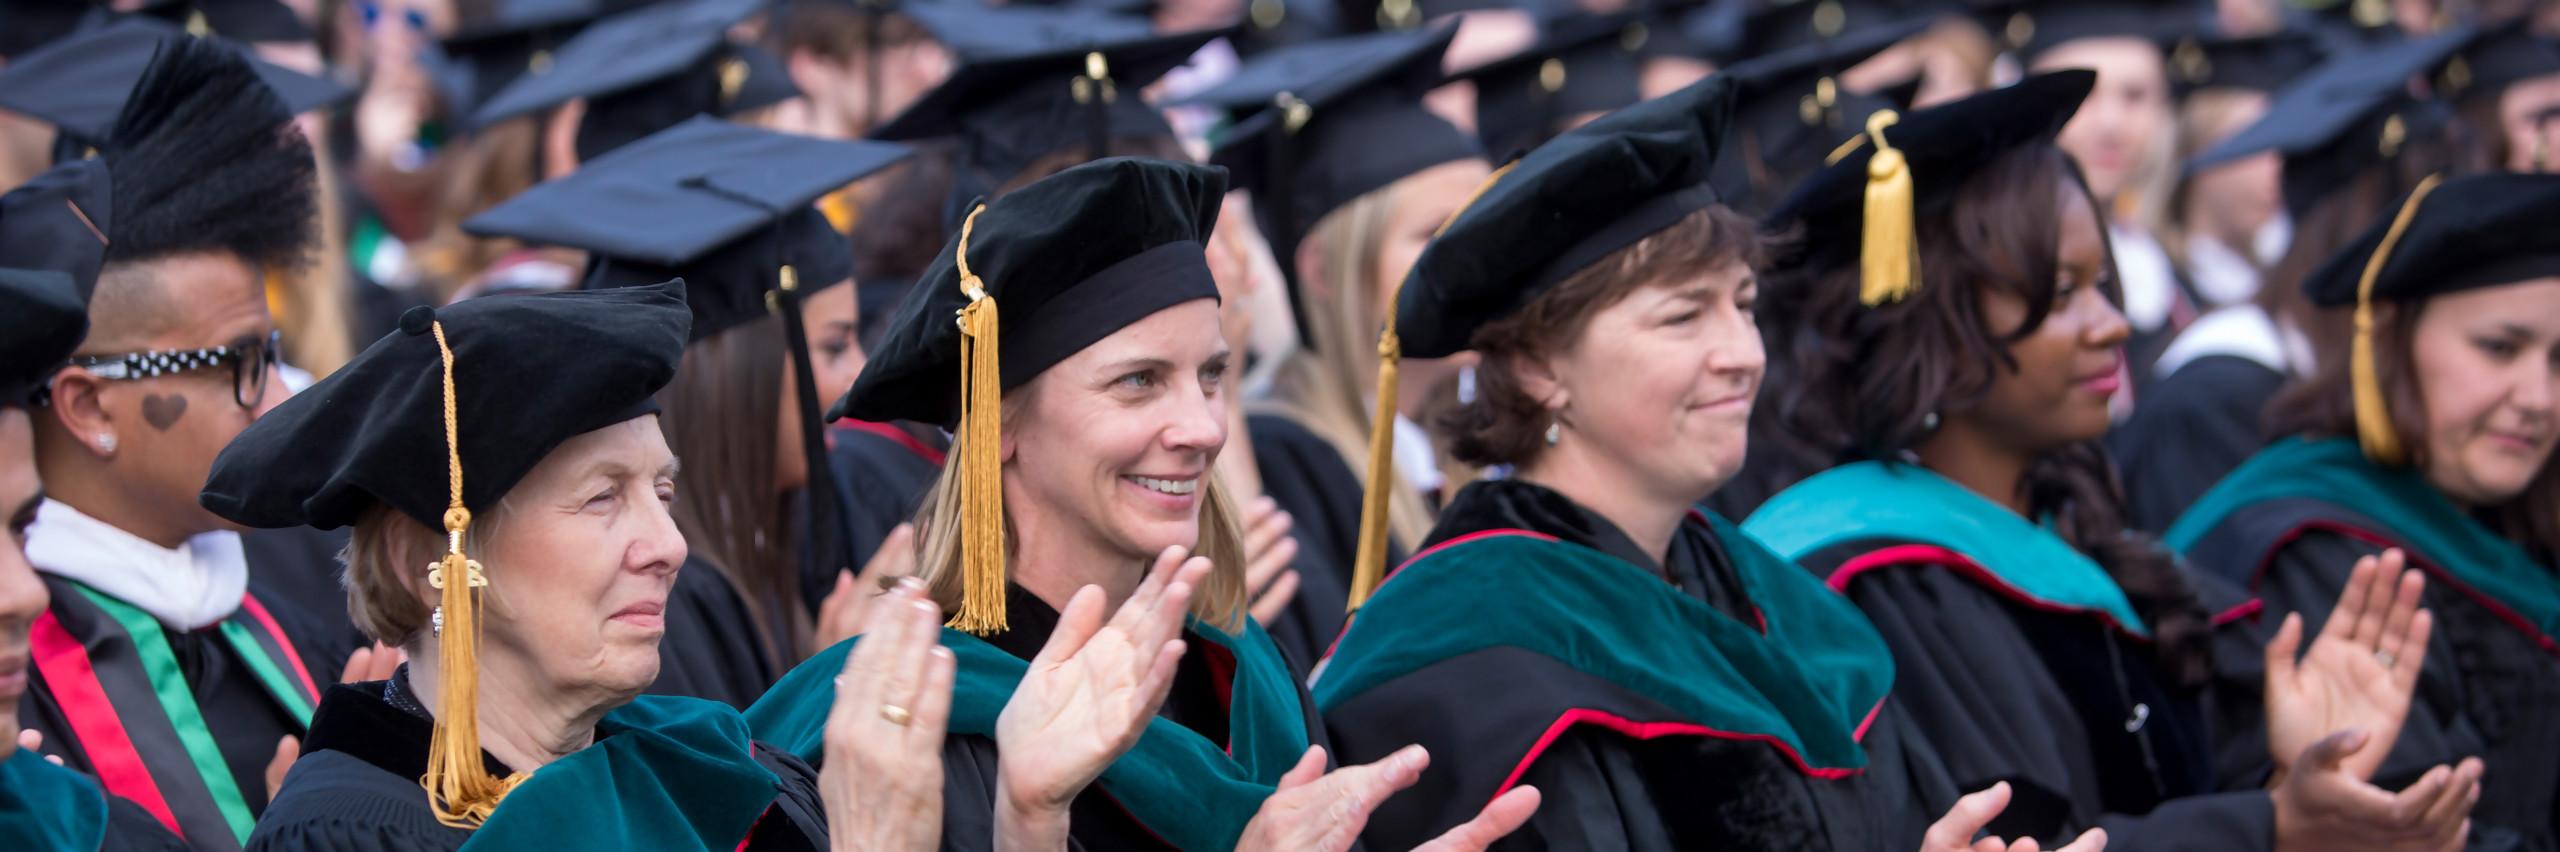 Graduate Commencement - Arcadia University